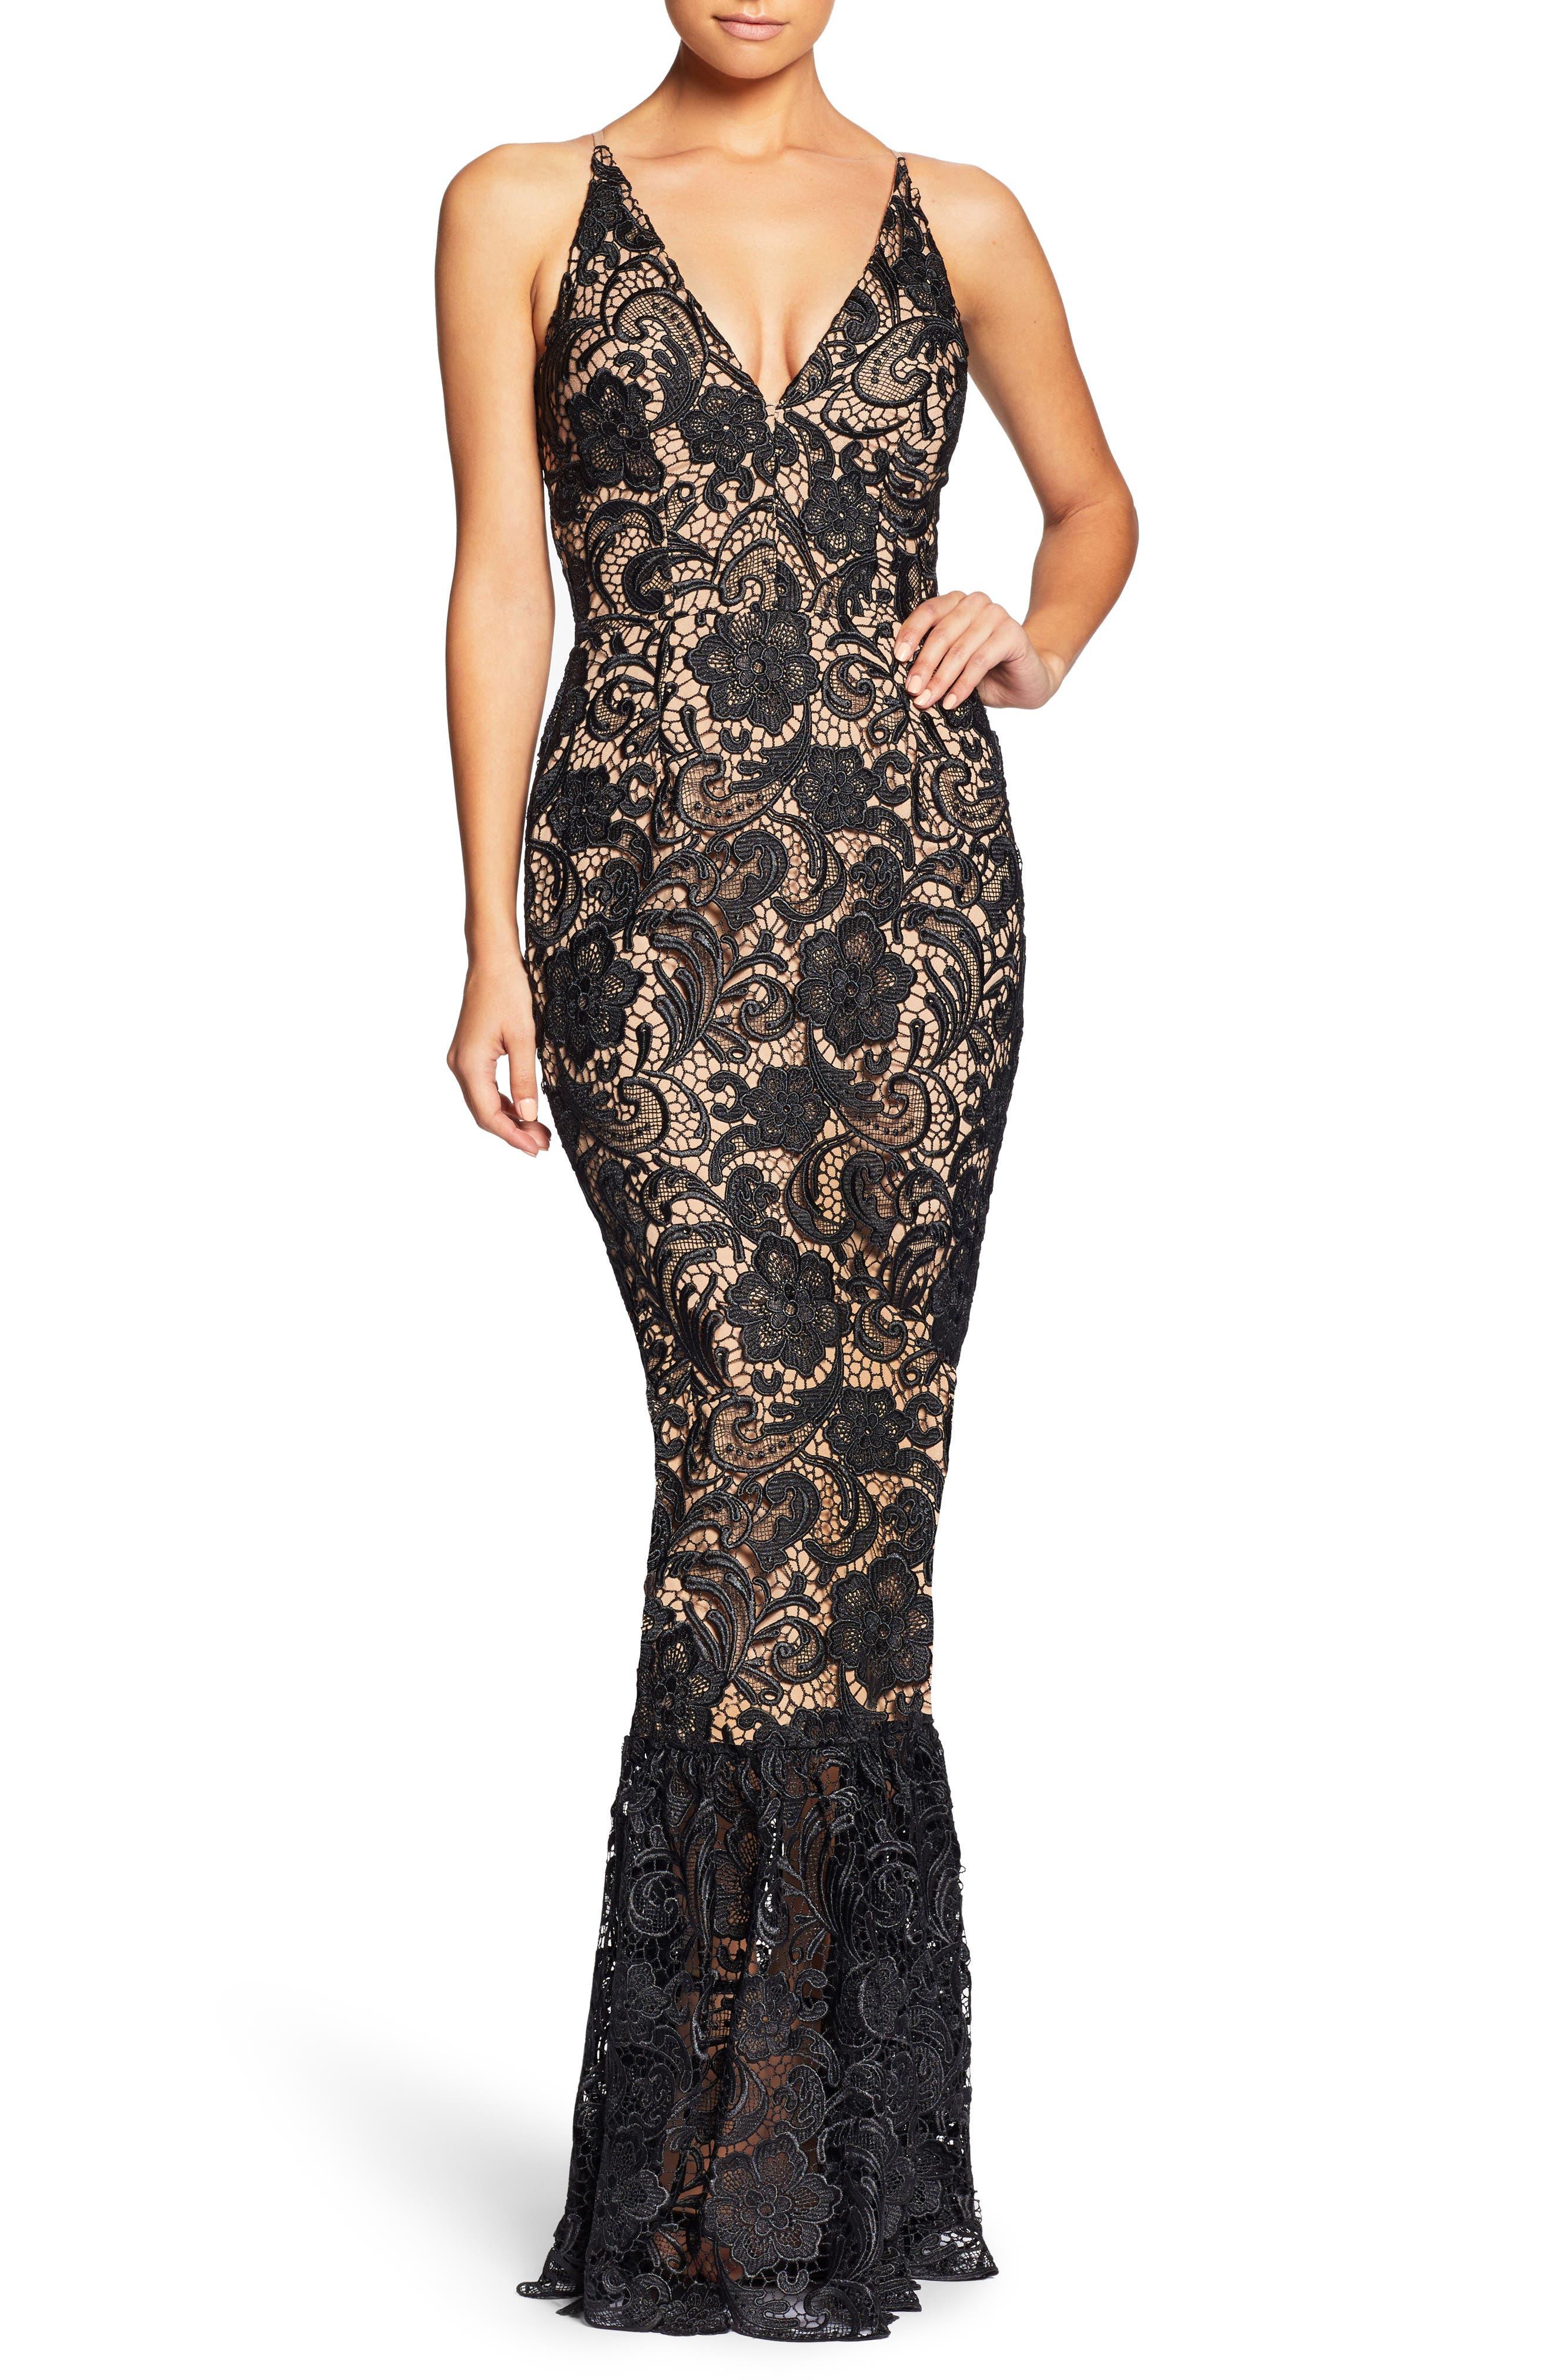 Sophia Crochet Lace Mermaid Gown,                             Main thumbnail 1, color,                             014